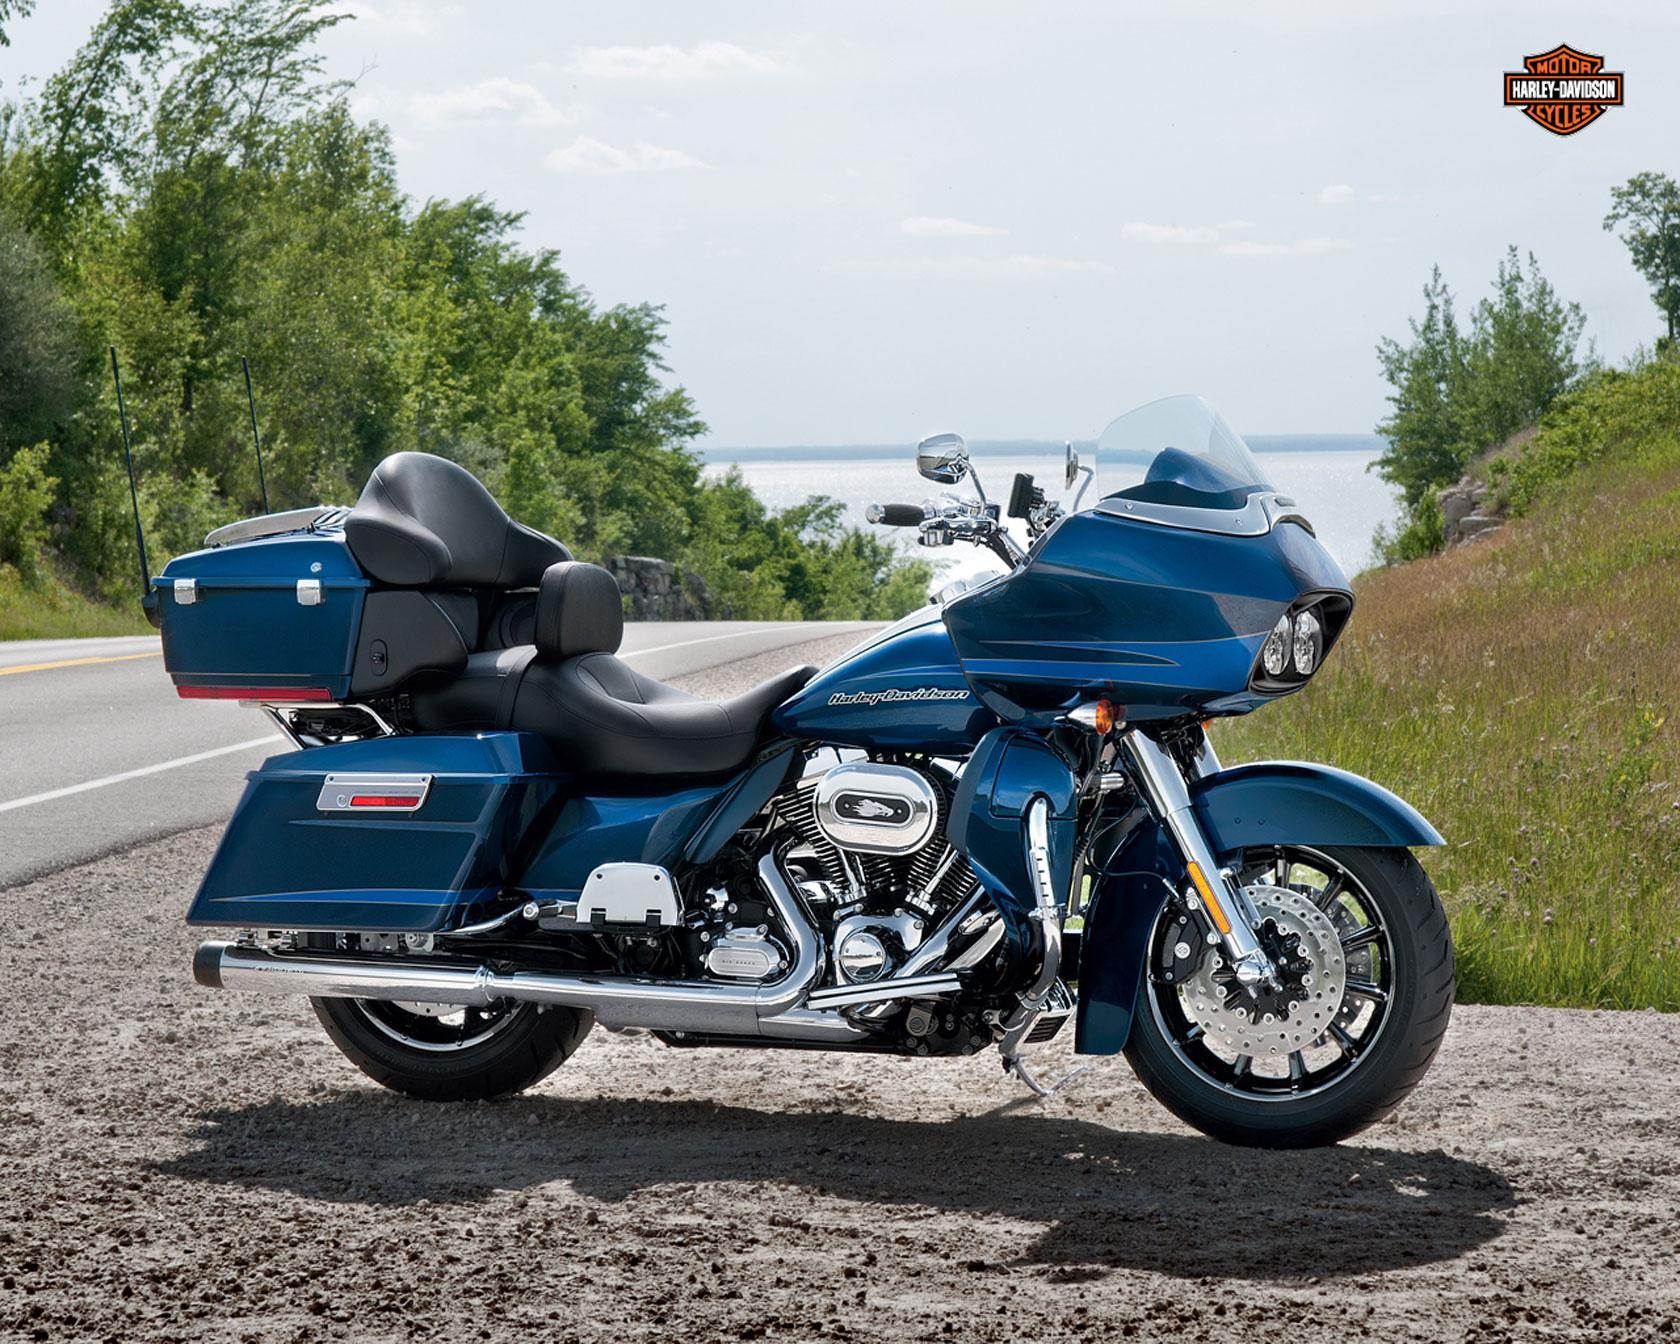 Harley Davidson Road Glide Custom Specs